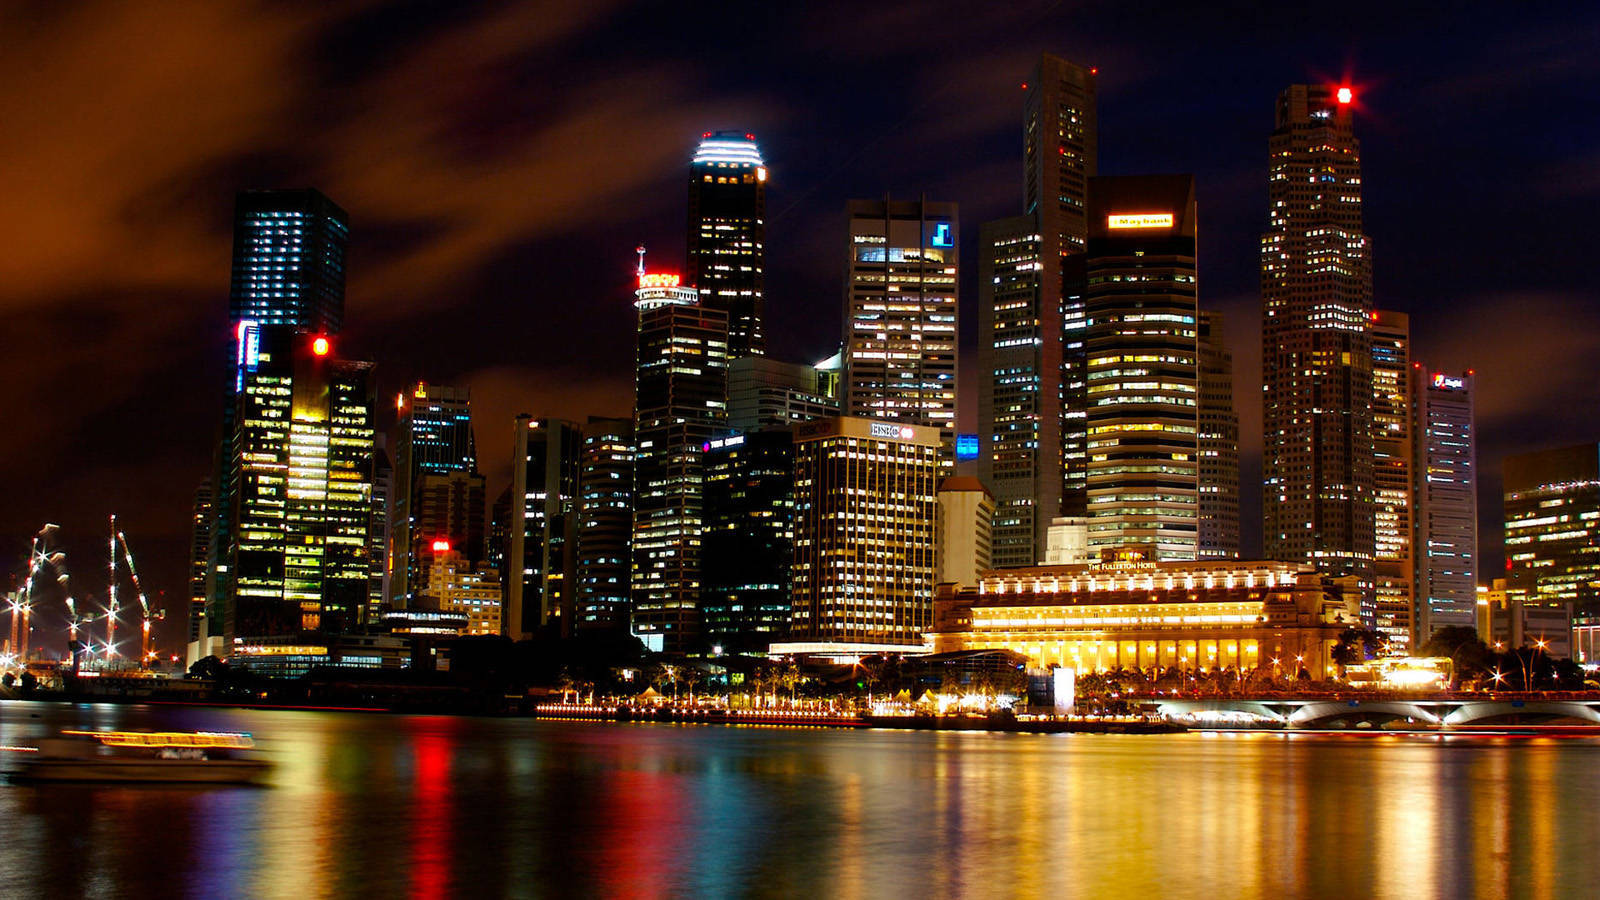 Singapore port city at night wallpaper city wallpaper 1600x900